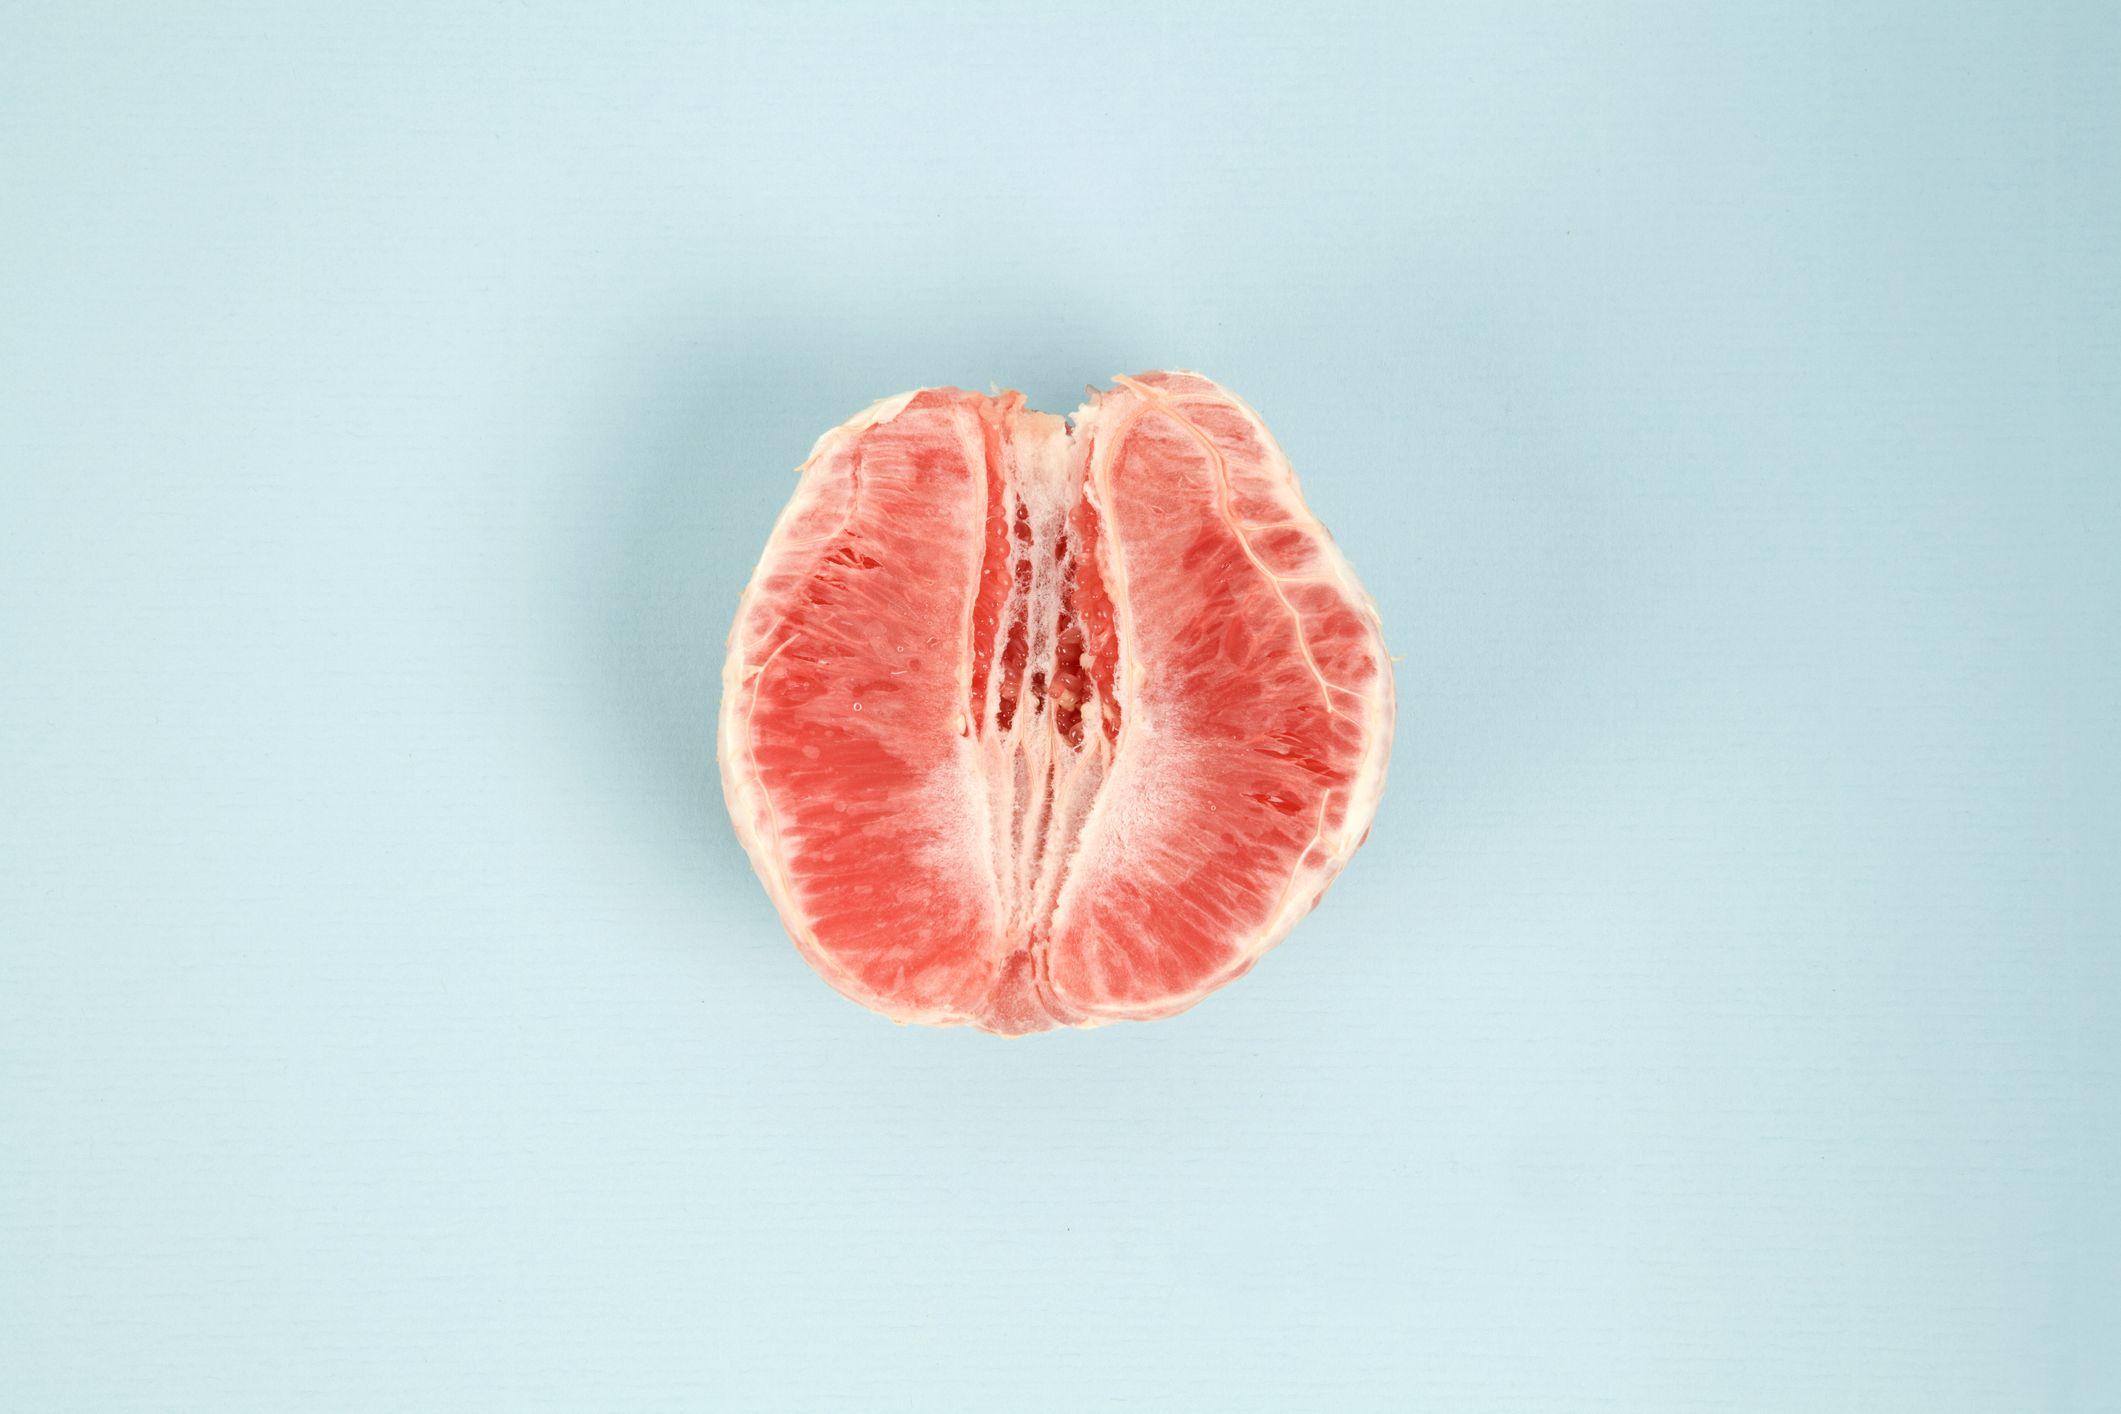 Porn hot backdoor bites vagina